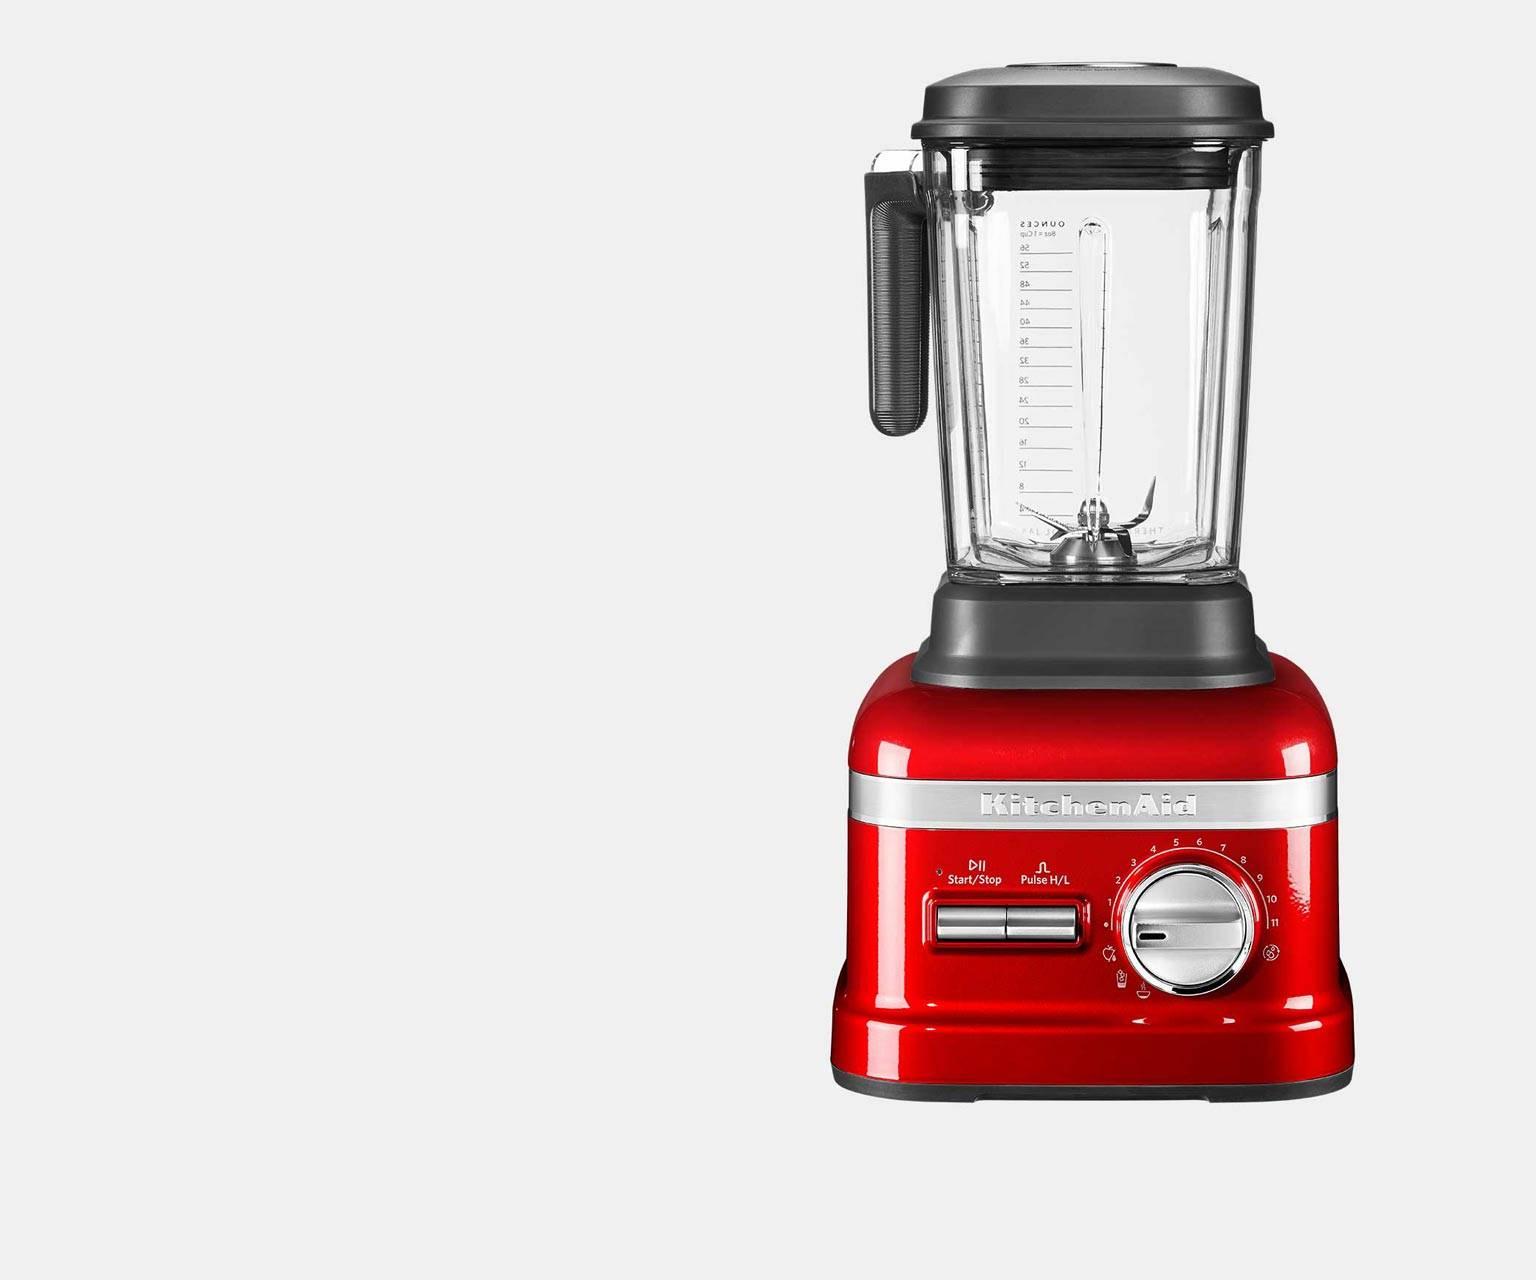 Blend Like No Other. KitchenAid ARTISAN Power Plus Blender